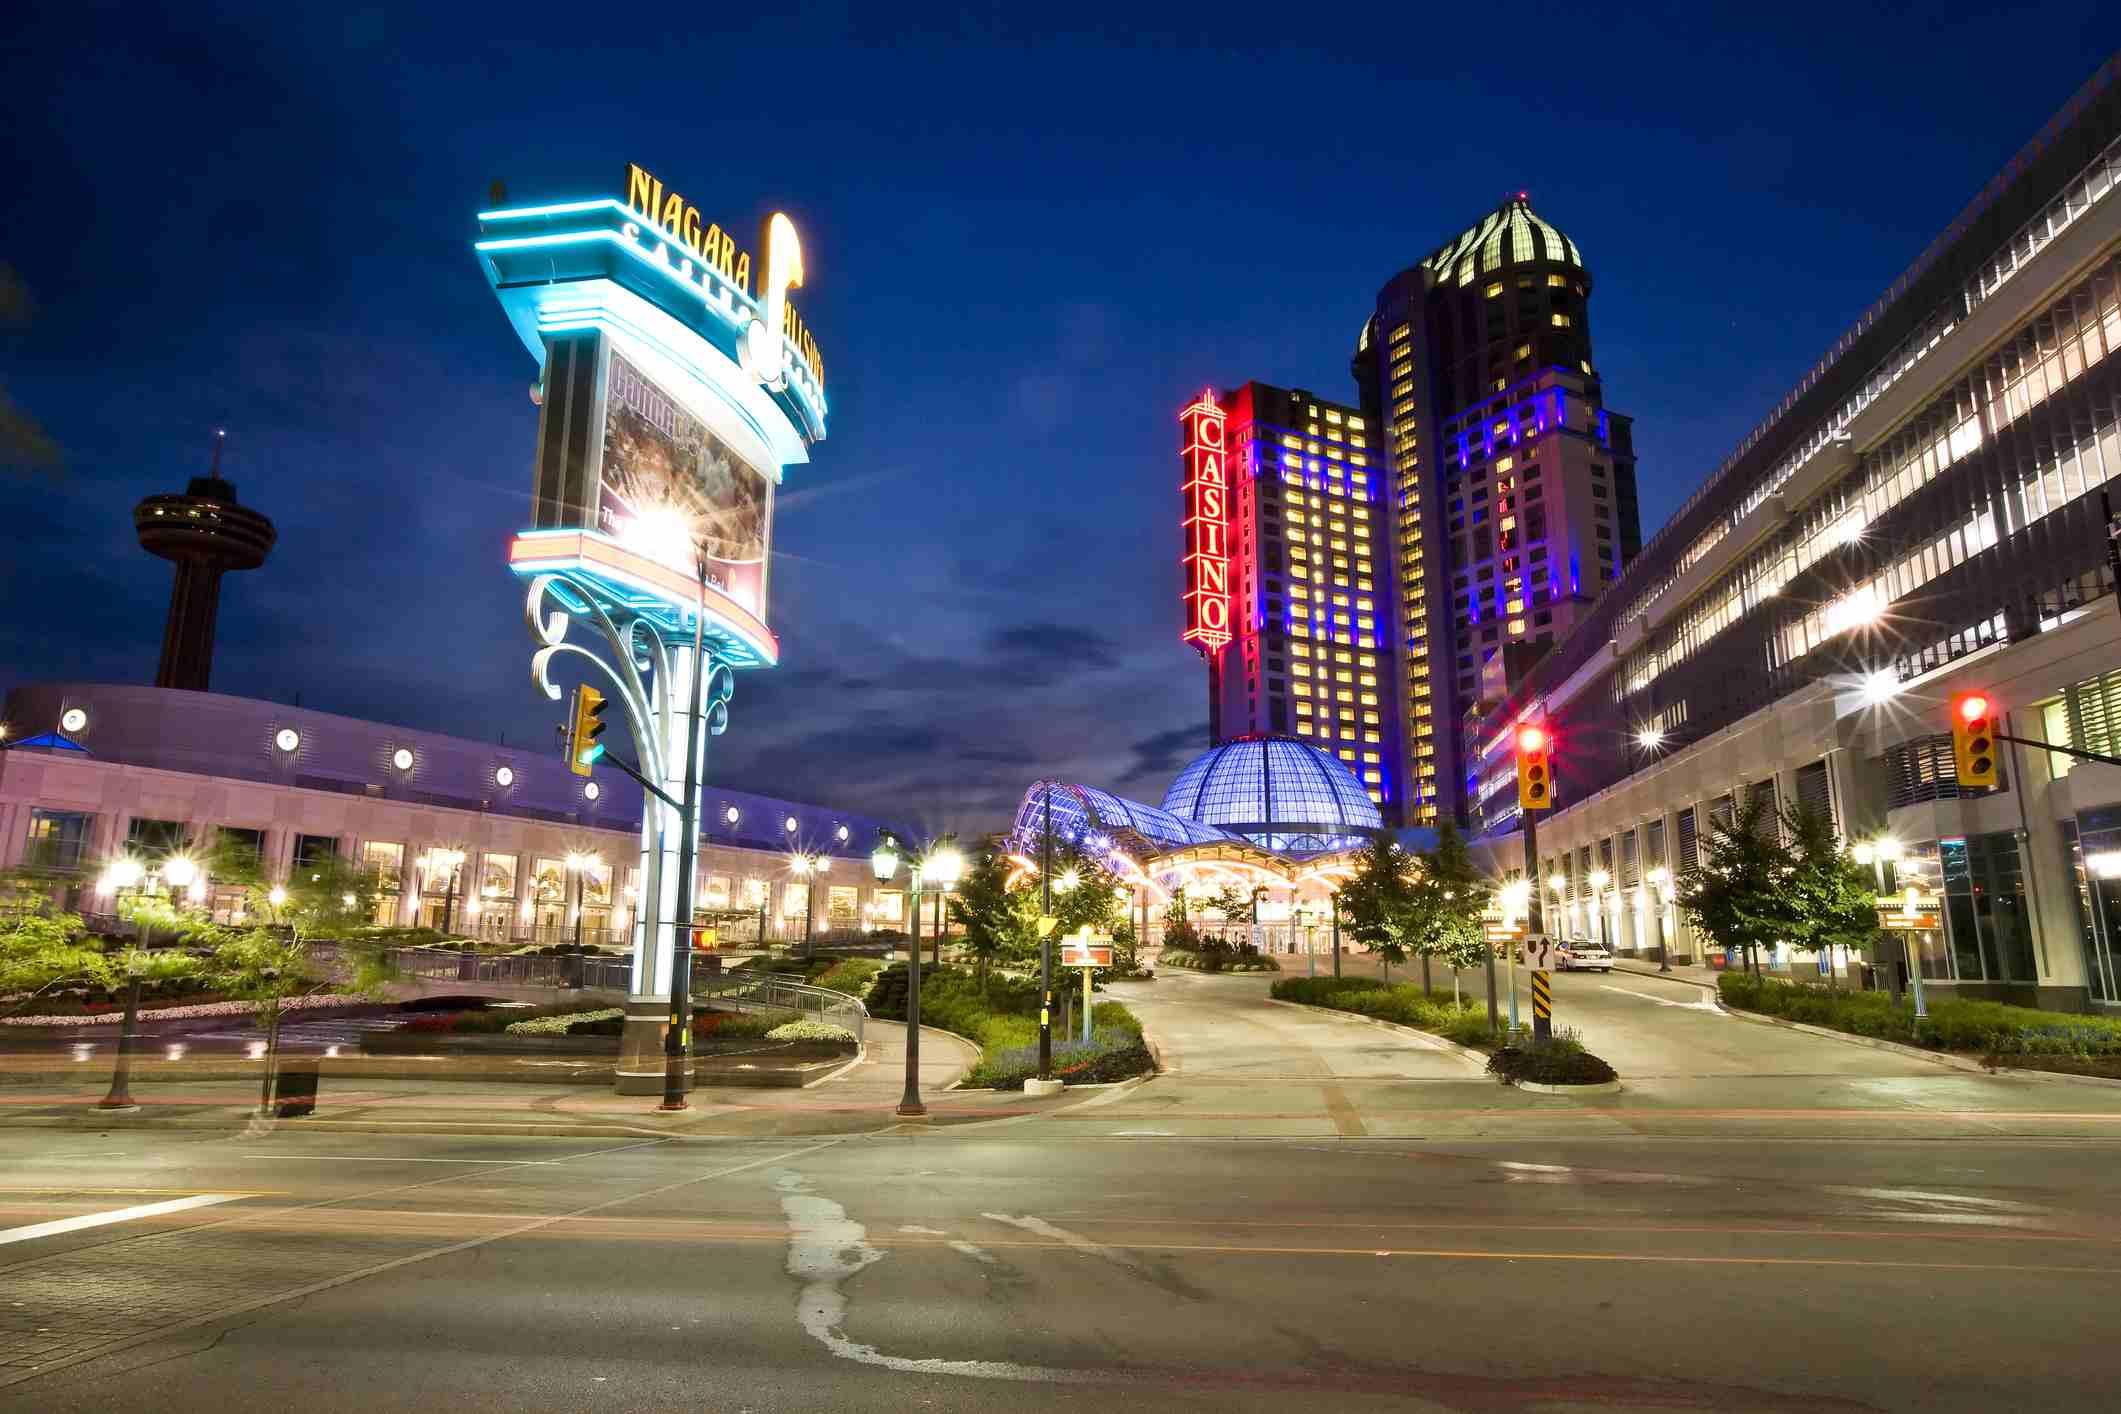 Niagara Falls Casino at night, Ontario, Canada.